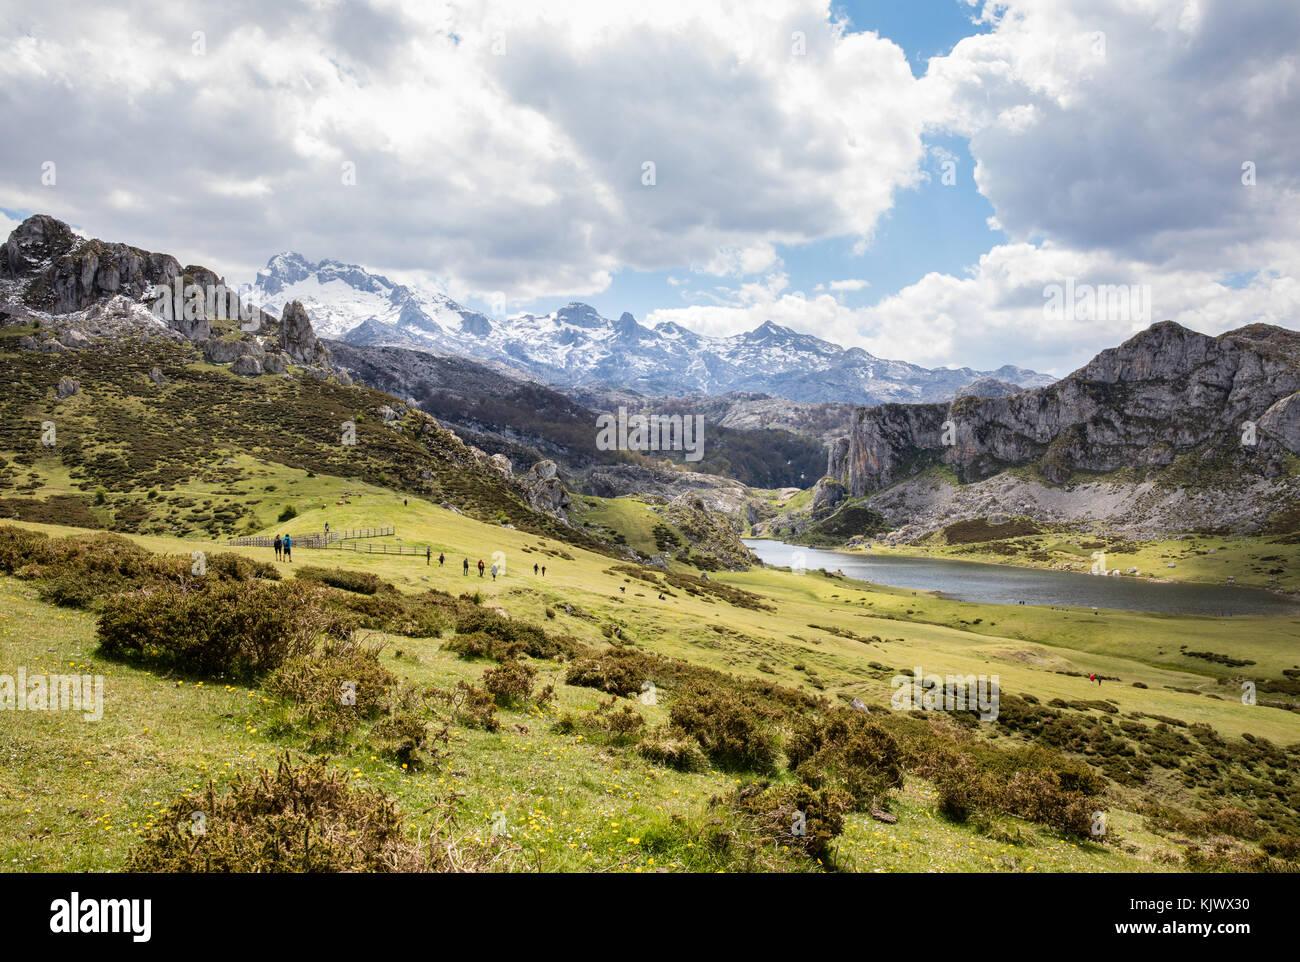 Lake Ercina near Covadonga in the Picos de Europa northern Spain - Stock Image